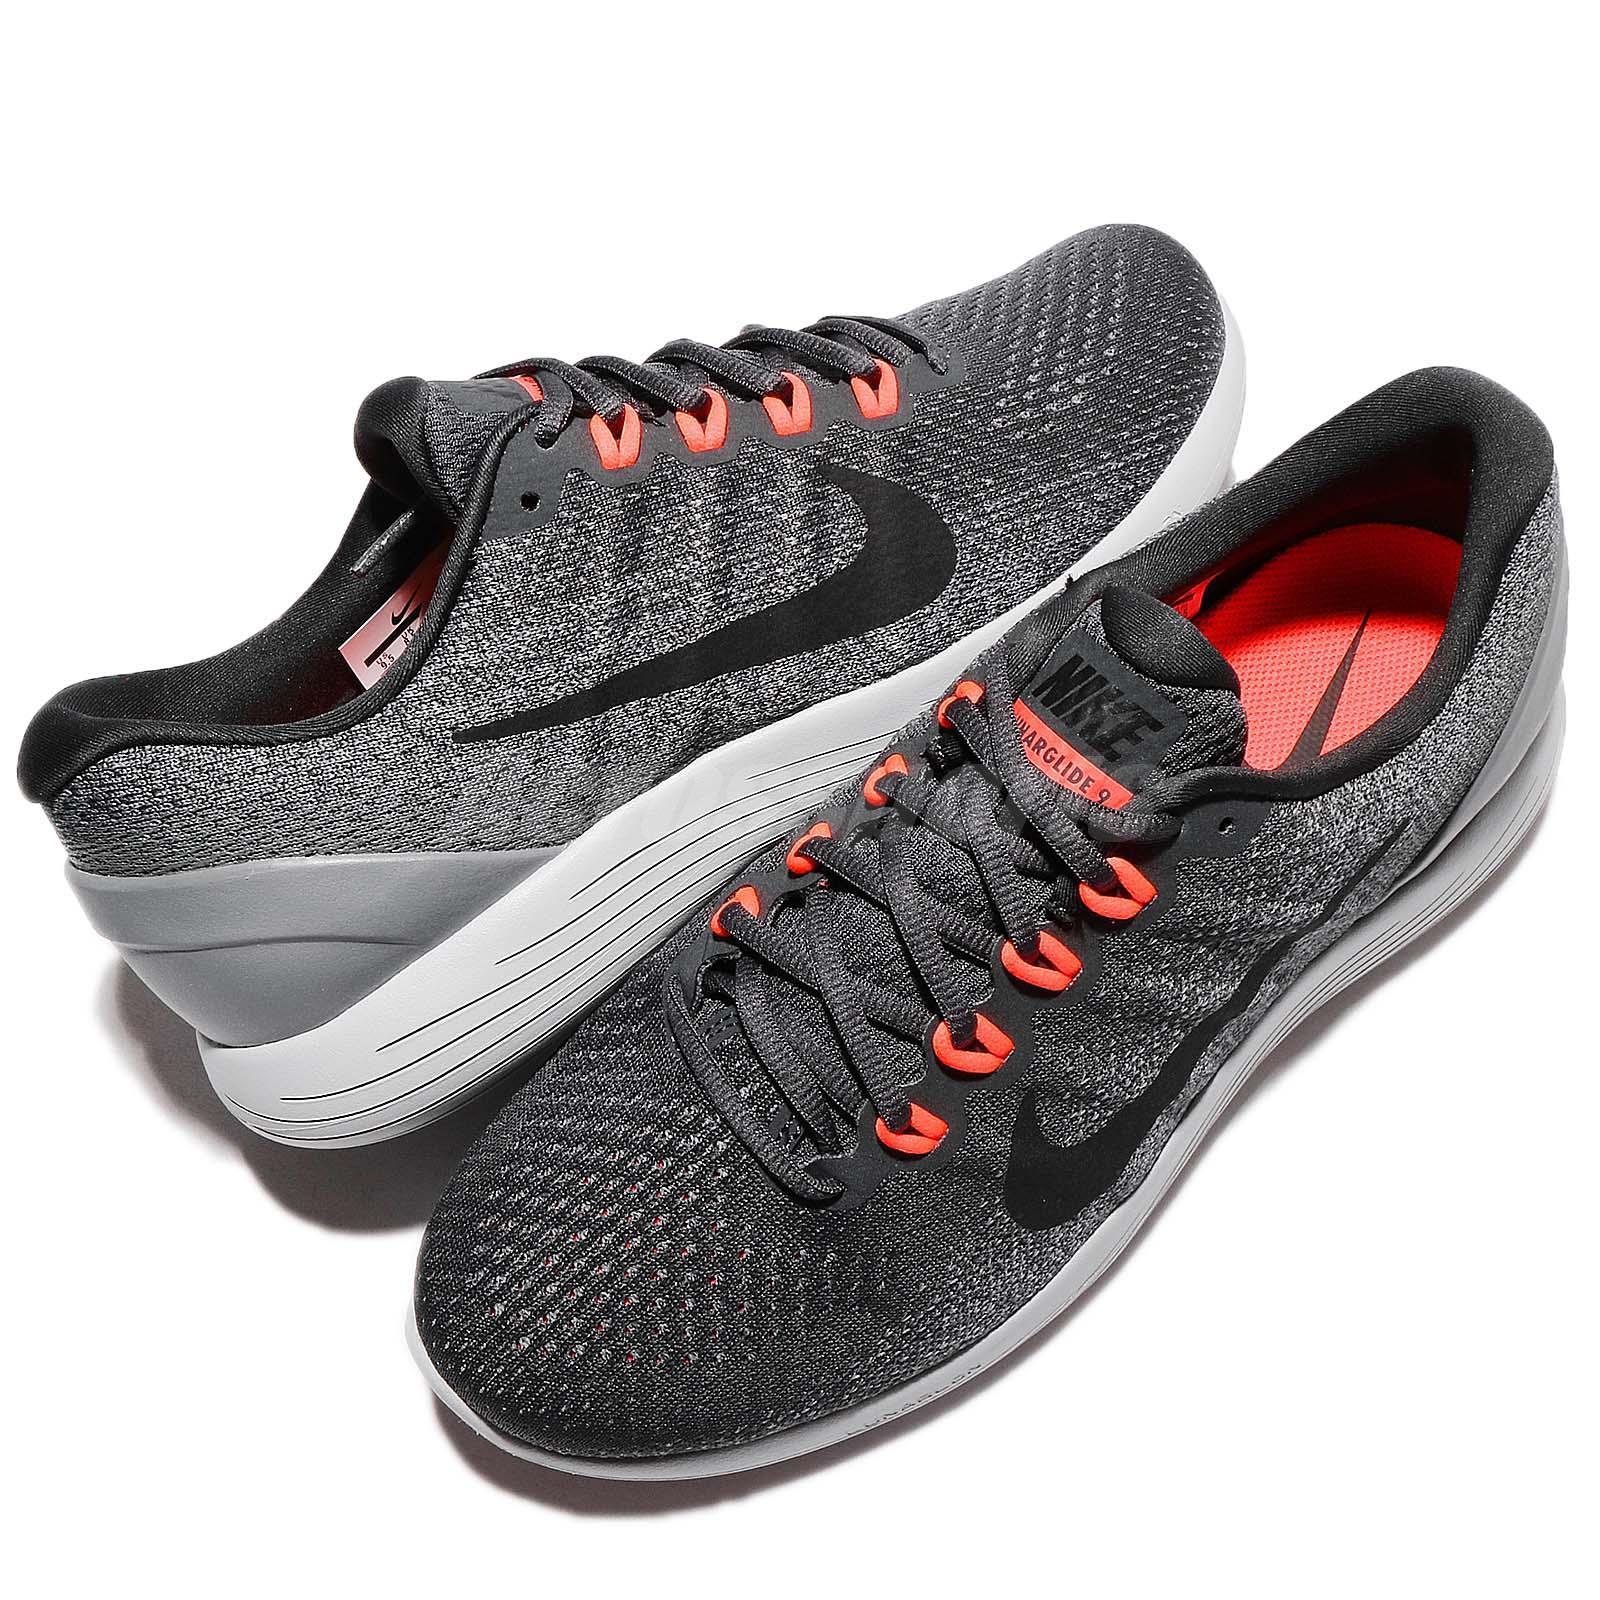 Nike Lunar Running Shoes Black